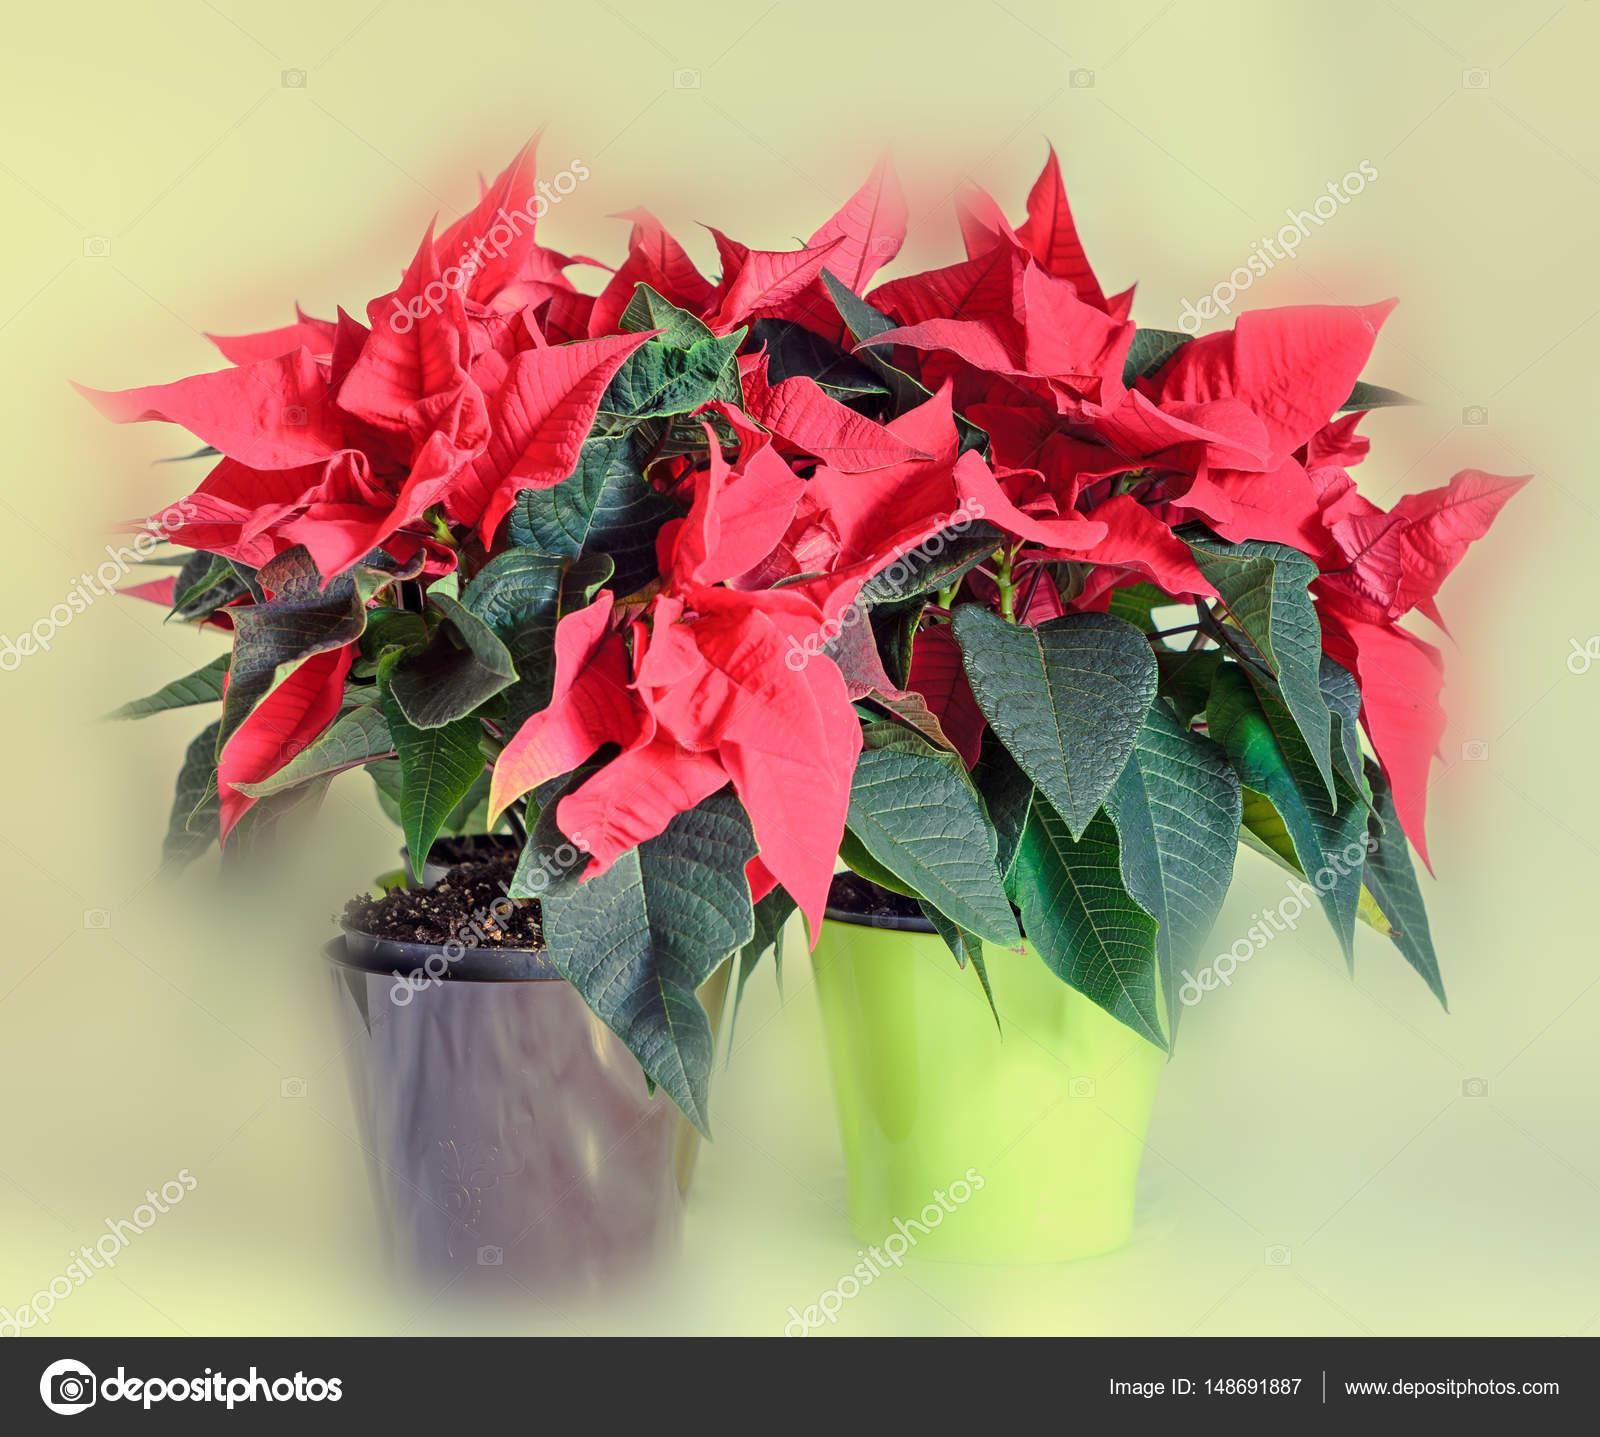 The Poinsettia Red Flowers Euphorbia Pulcherrima Stock Photo